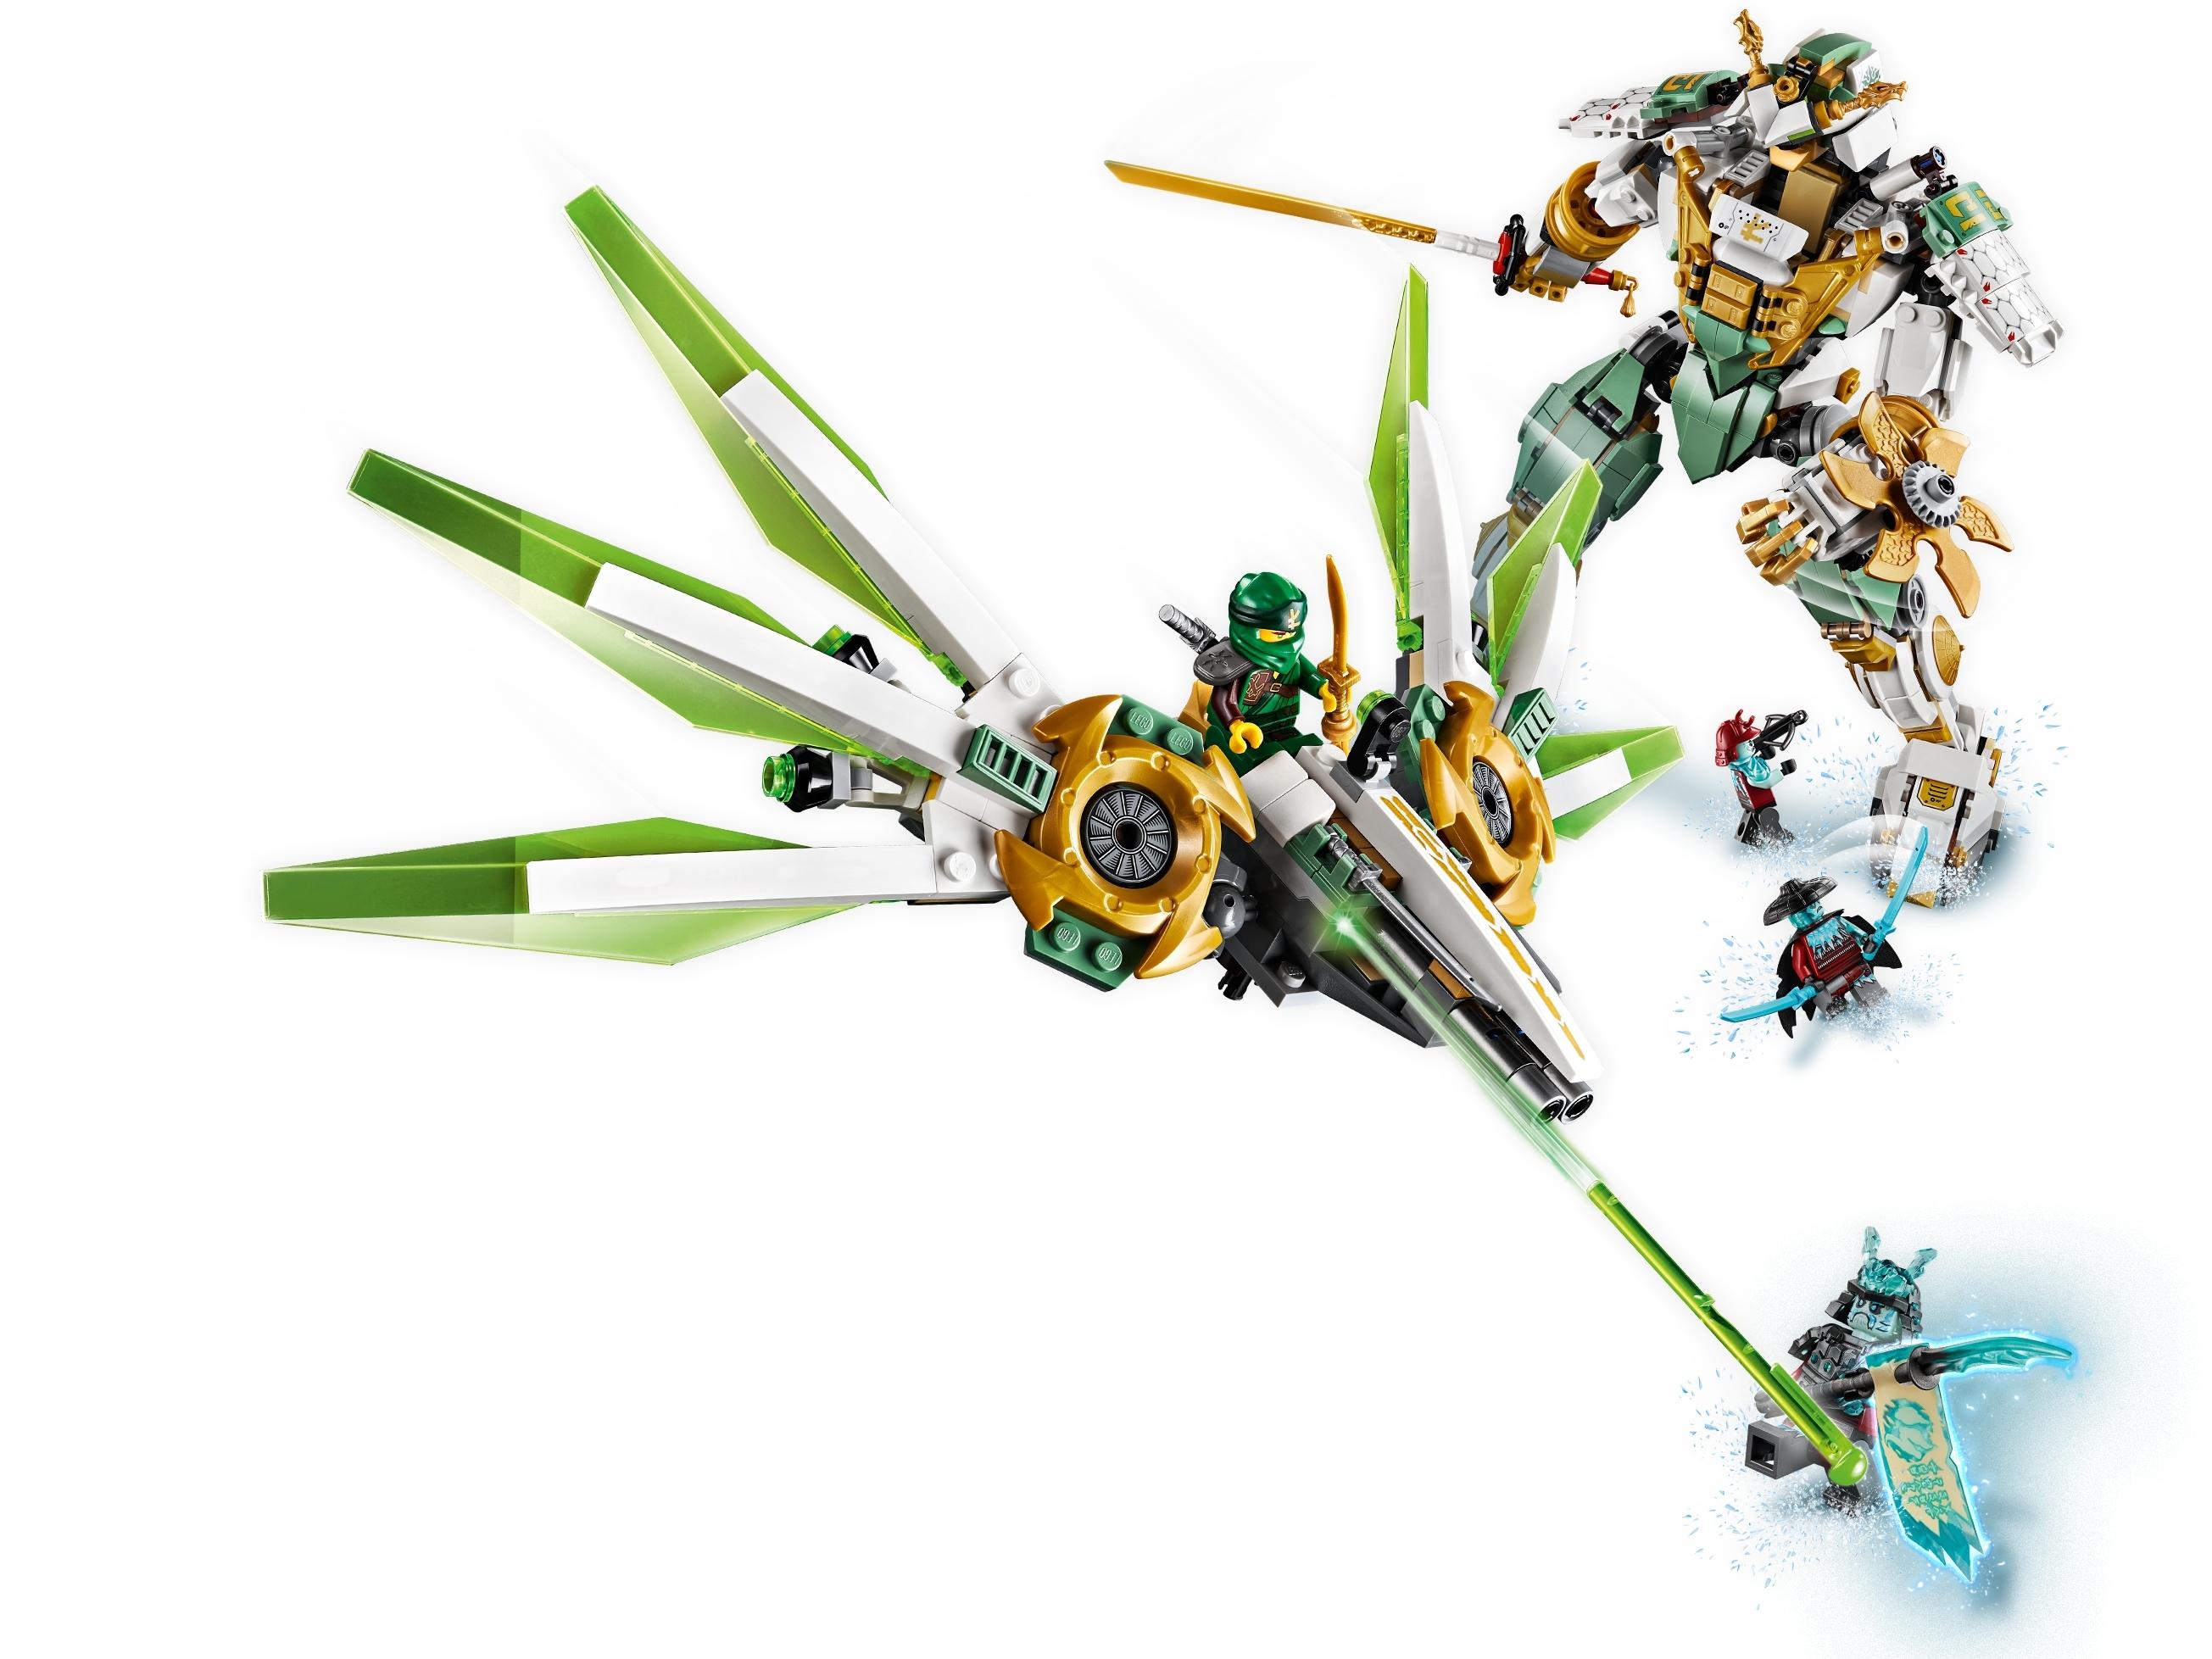 Lloyd S Titan Mech 70676 Ninjago Buy Online At The Official Lego Shop Us